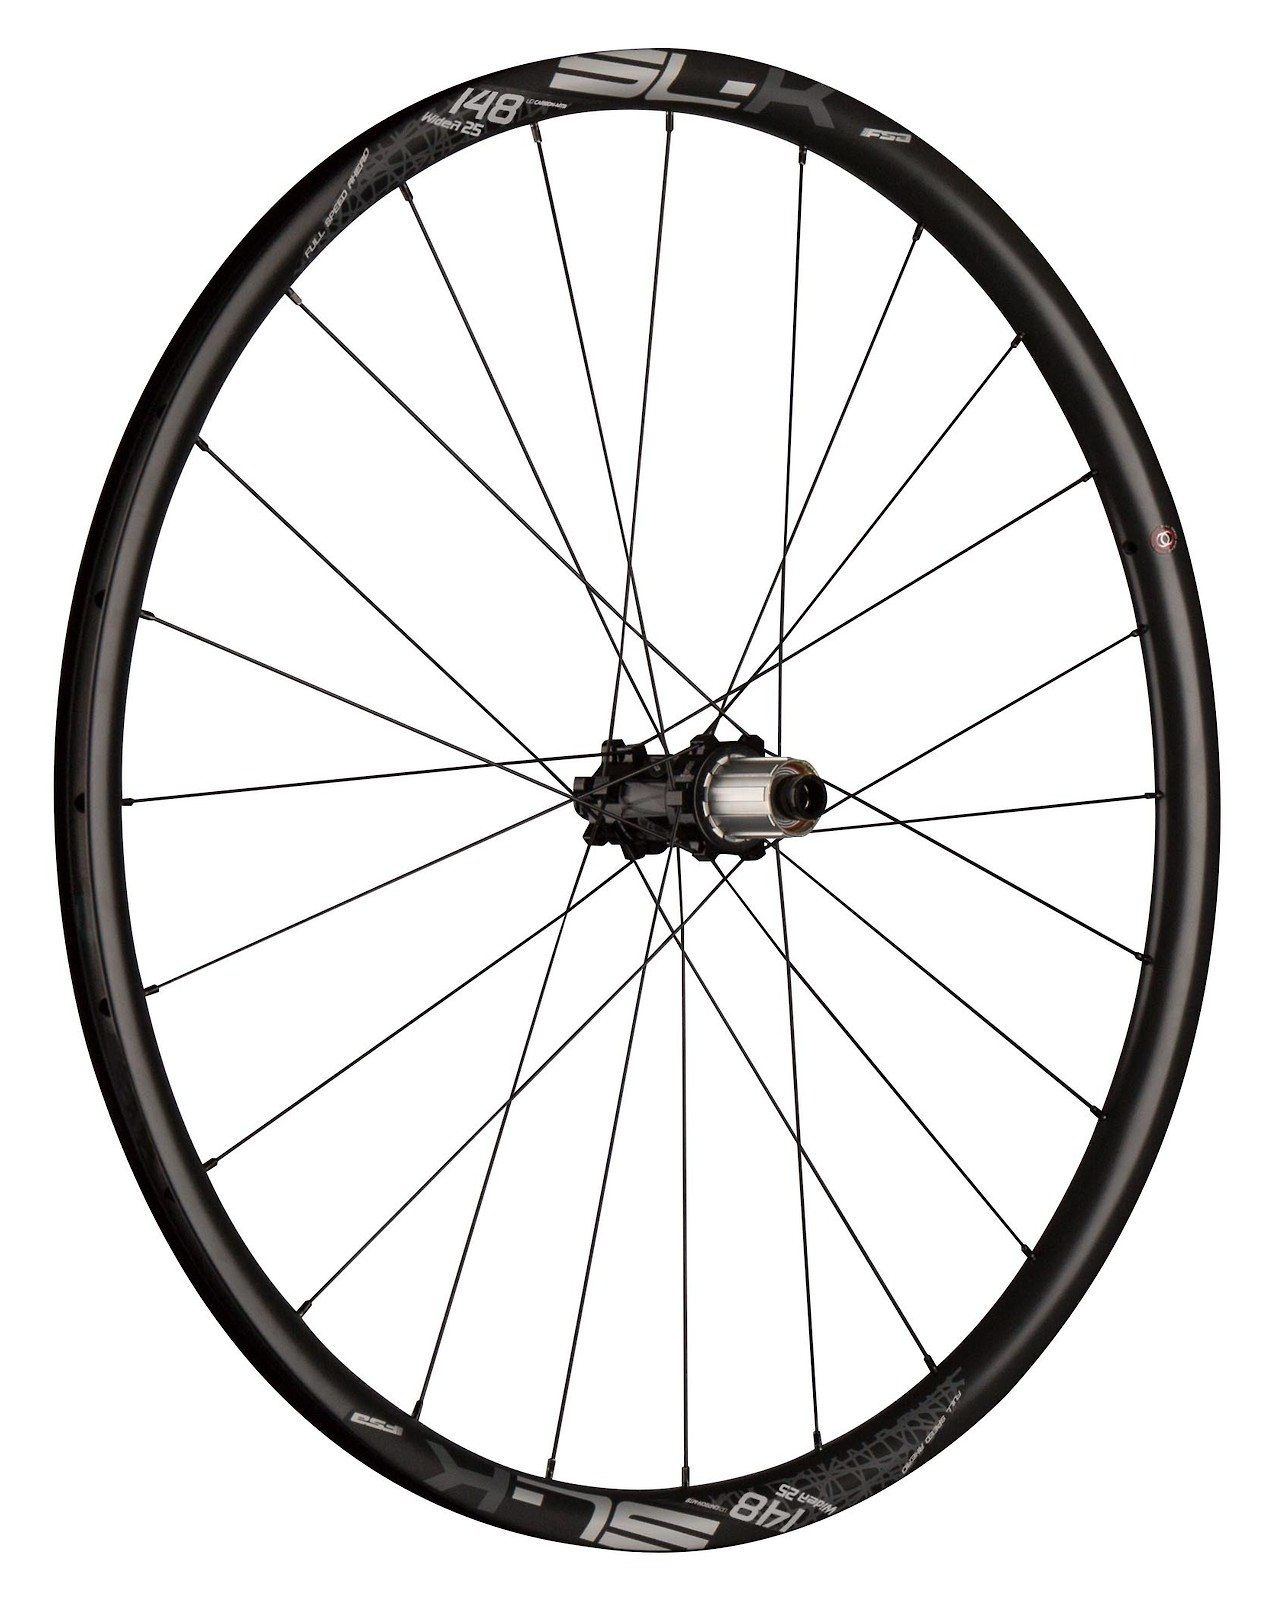 FSA SL-K WideR25 Rear Wheel